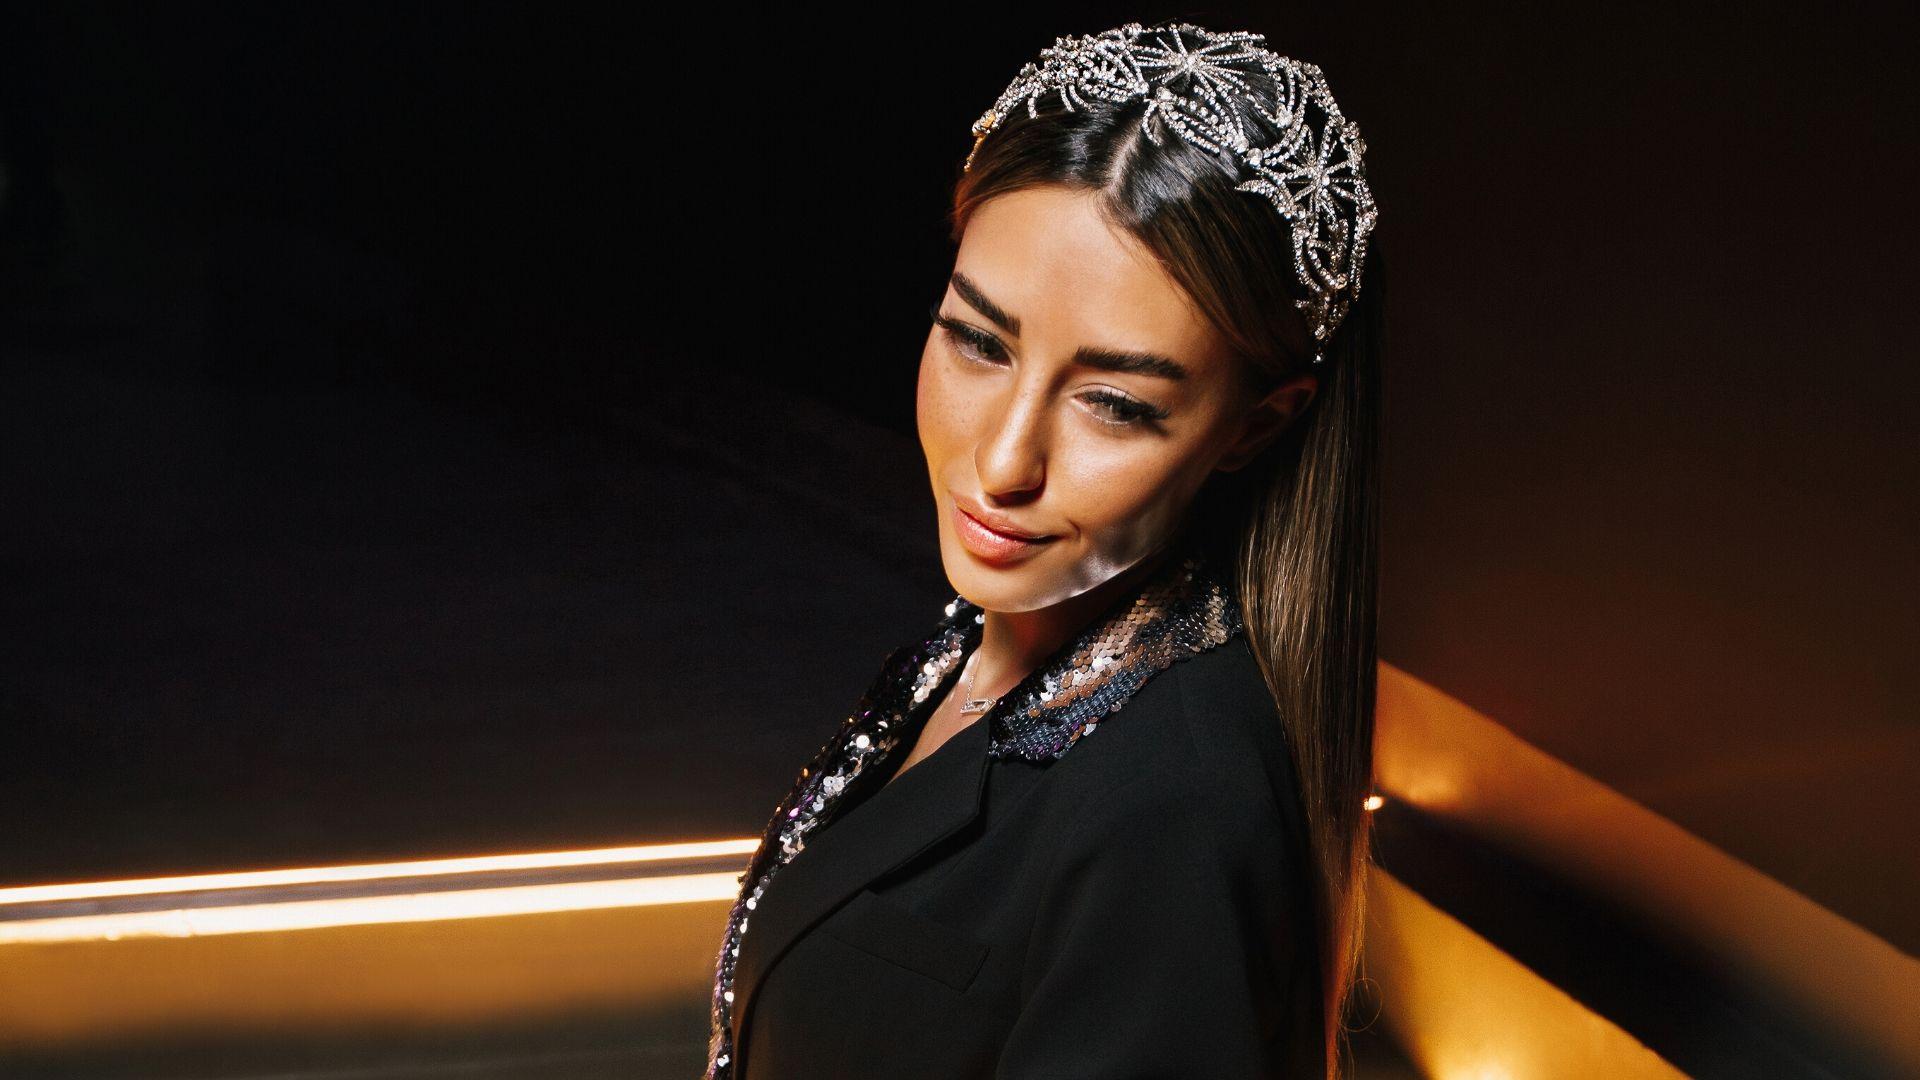 Aura headpieces, fashion, headpieces, arab designers